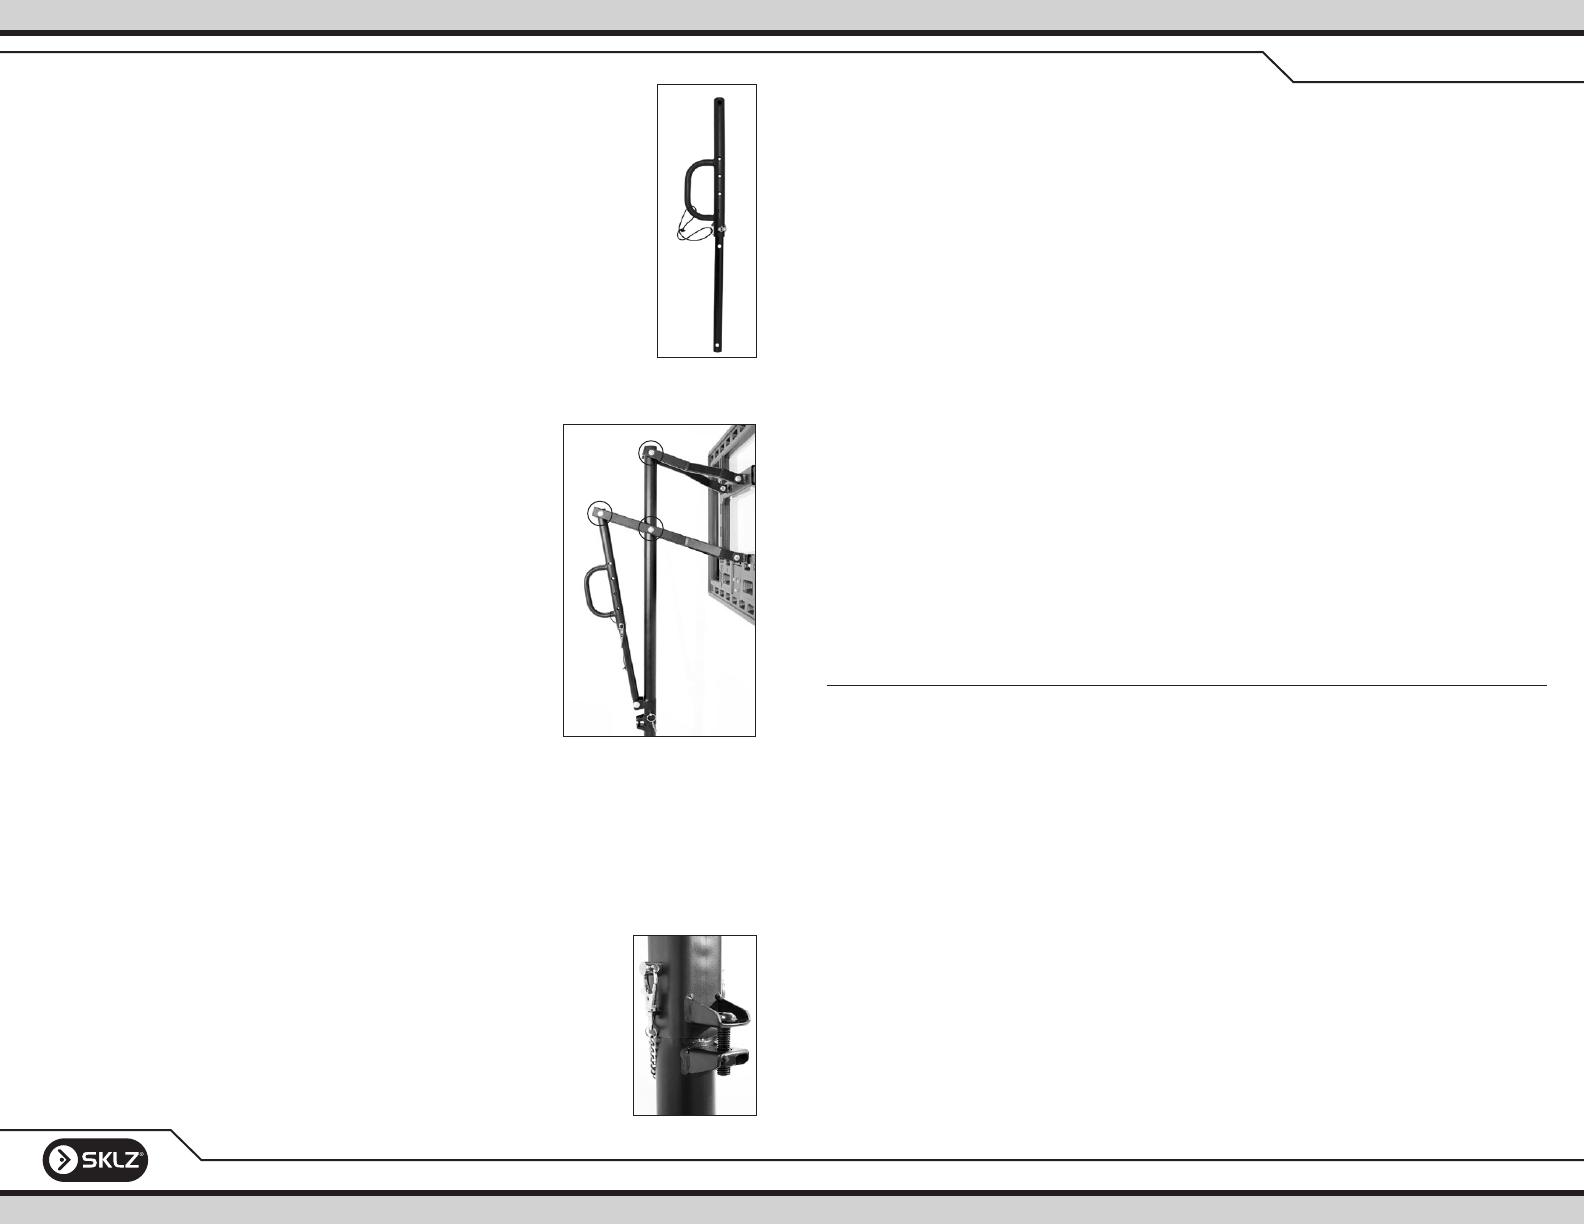 Pro Mini Hoop System Instructions